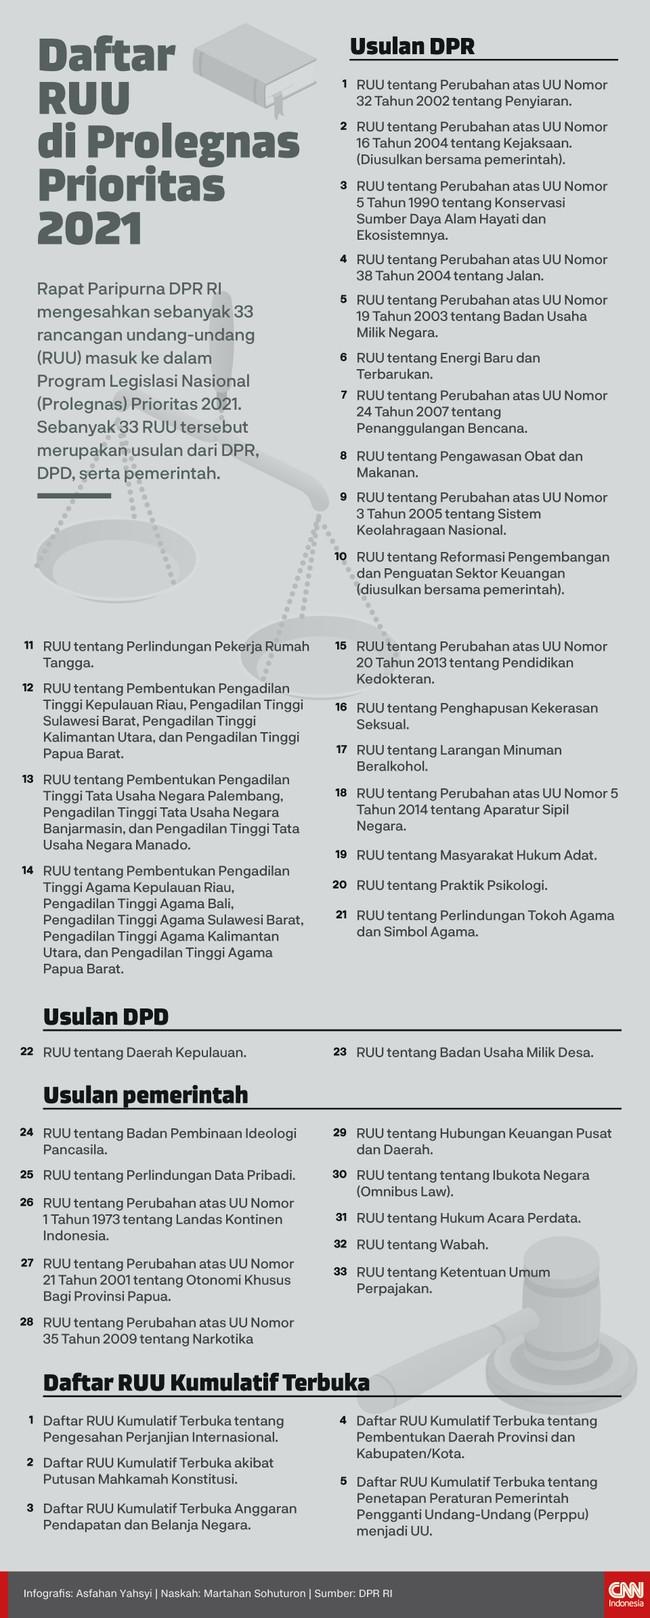 Rapat Paripurna DPR RI mengesahkan 33 Rancangan Undang-undang (RUU) masuk Program Legislasi Nasional (Prolegnas) Prioritas 2021.